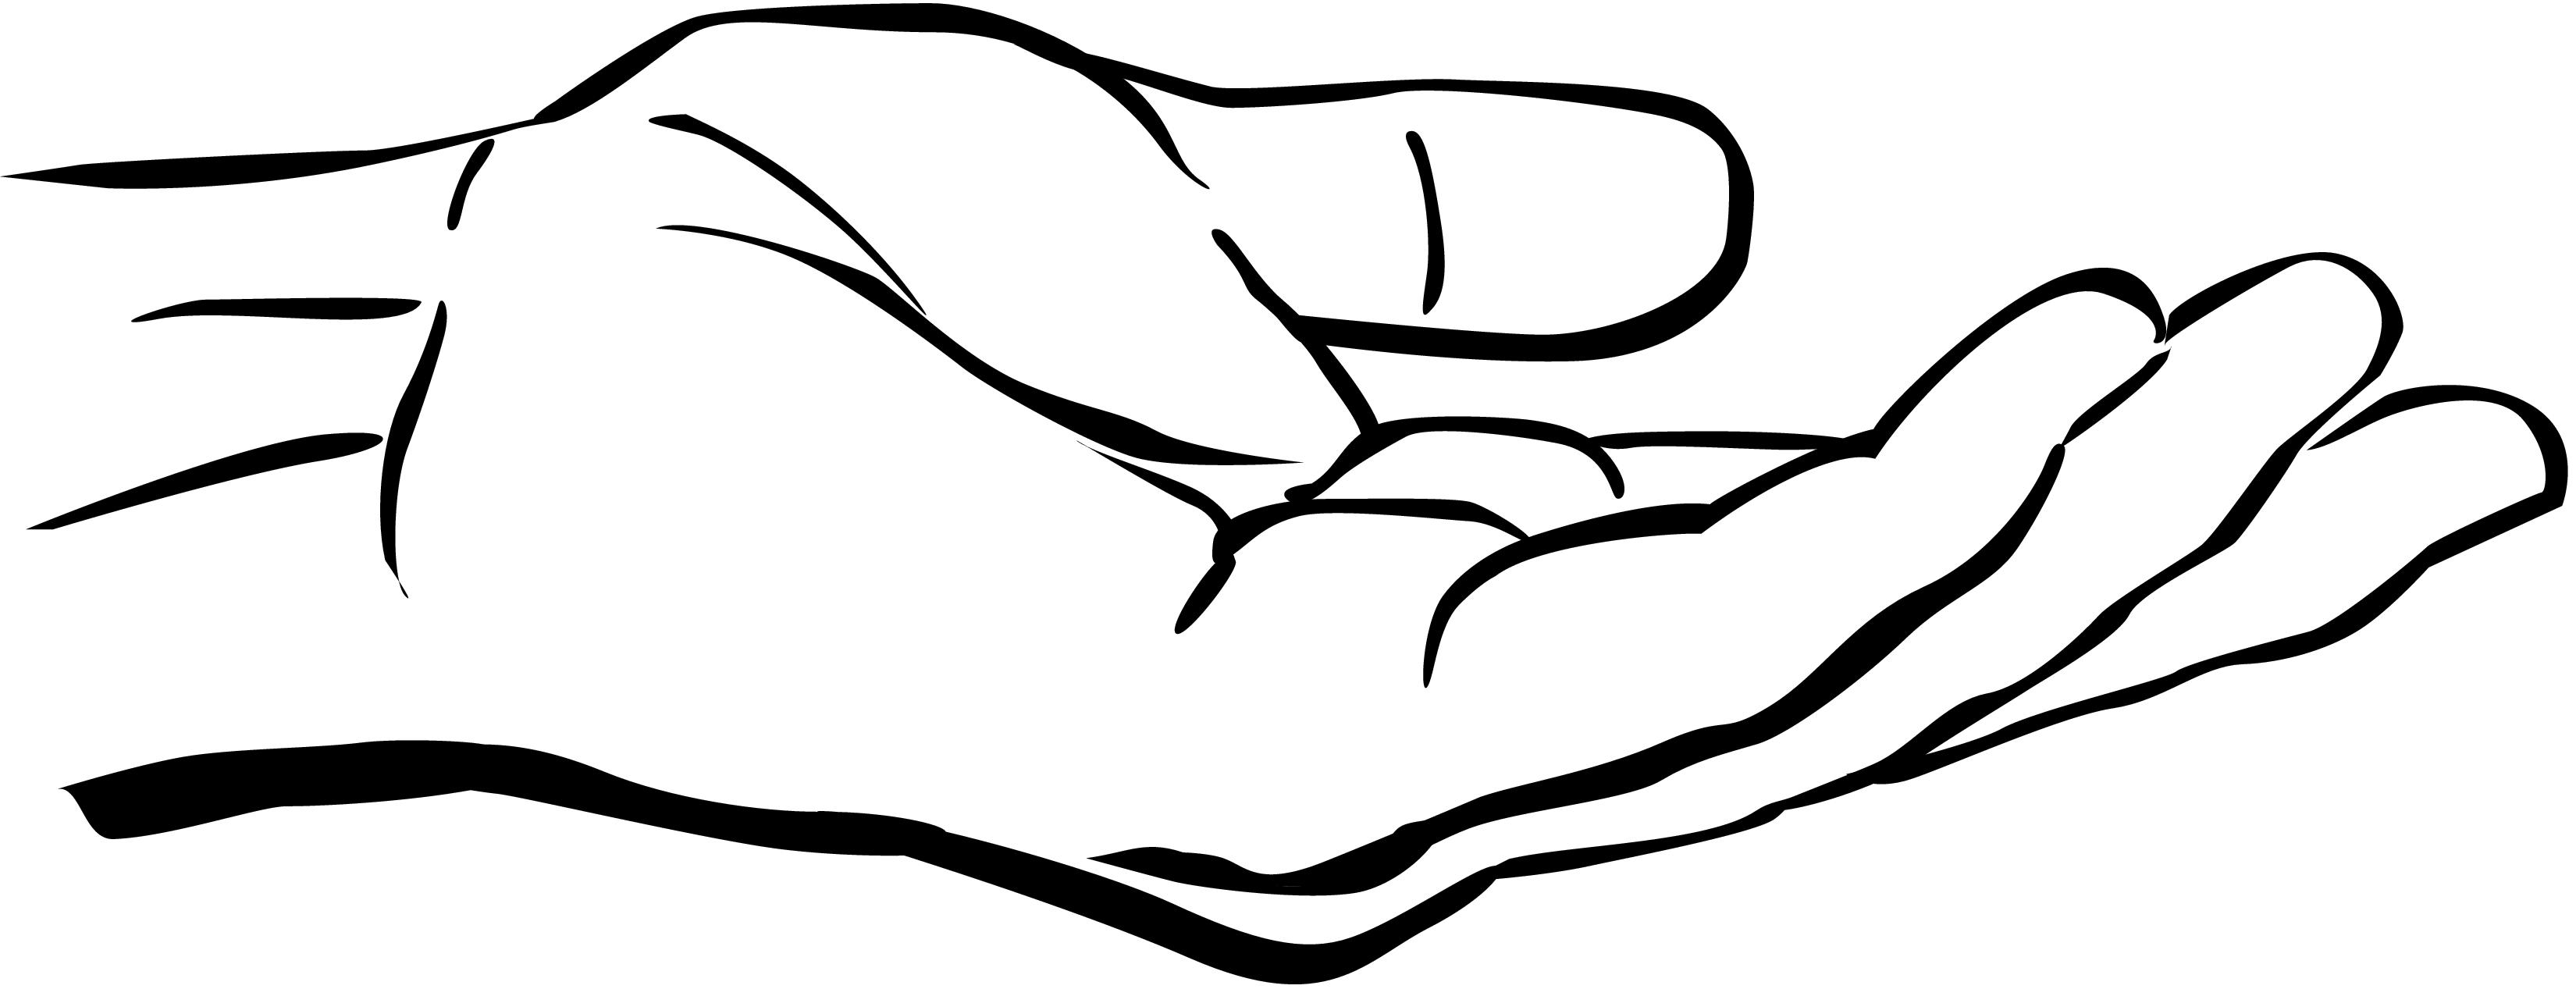 3300x1267 Wonderful Inspiration Hand Clipart Clip Art Free Panda Images